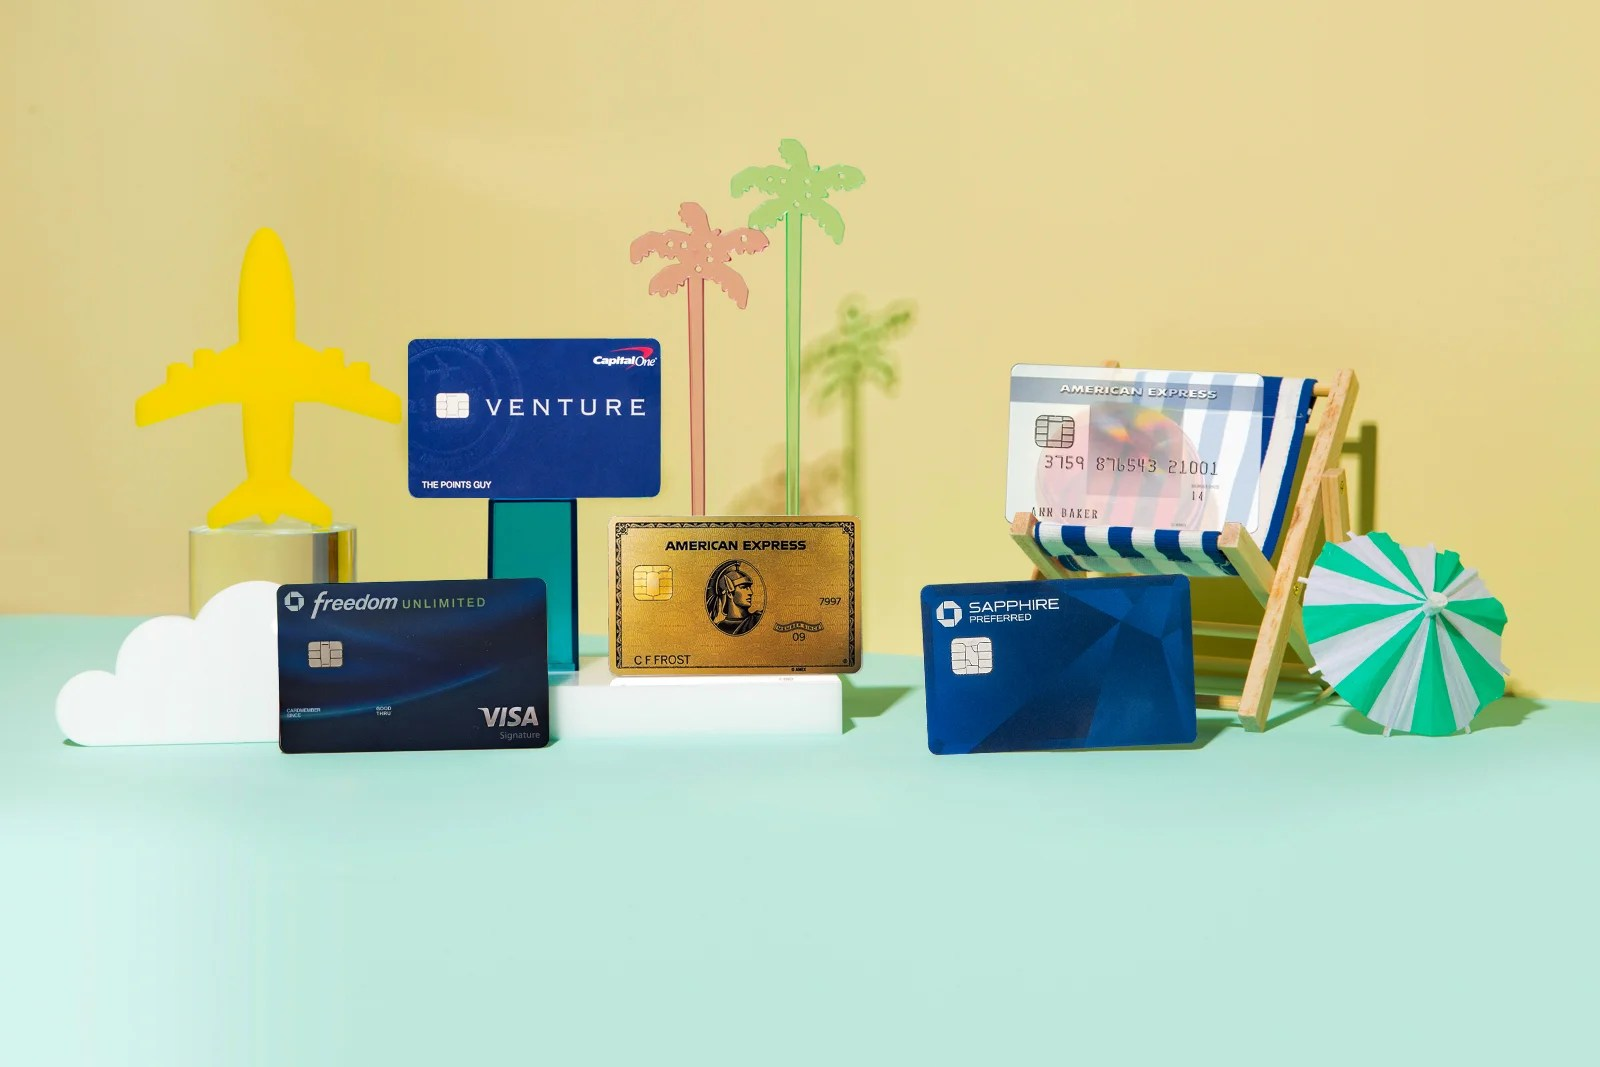 Capital one credit card change last name